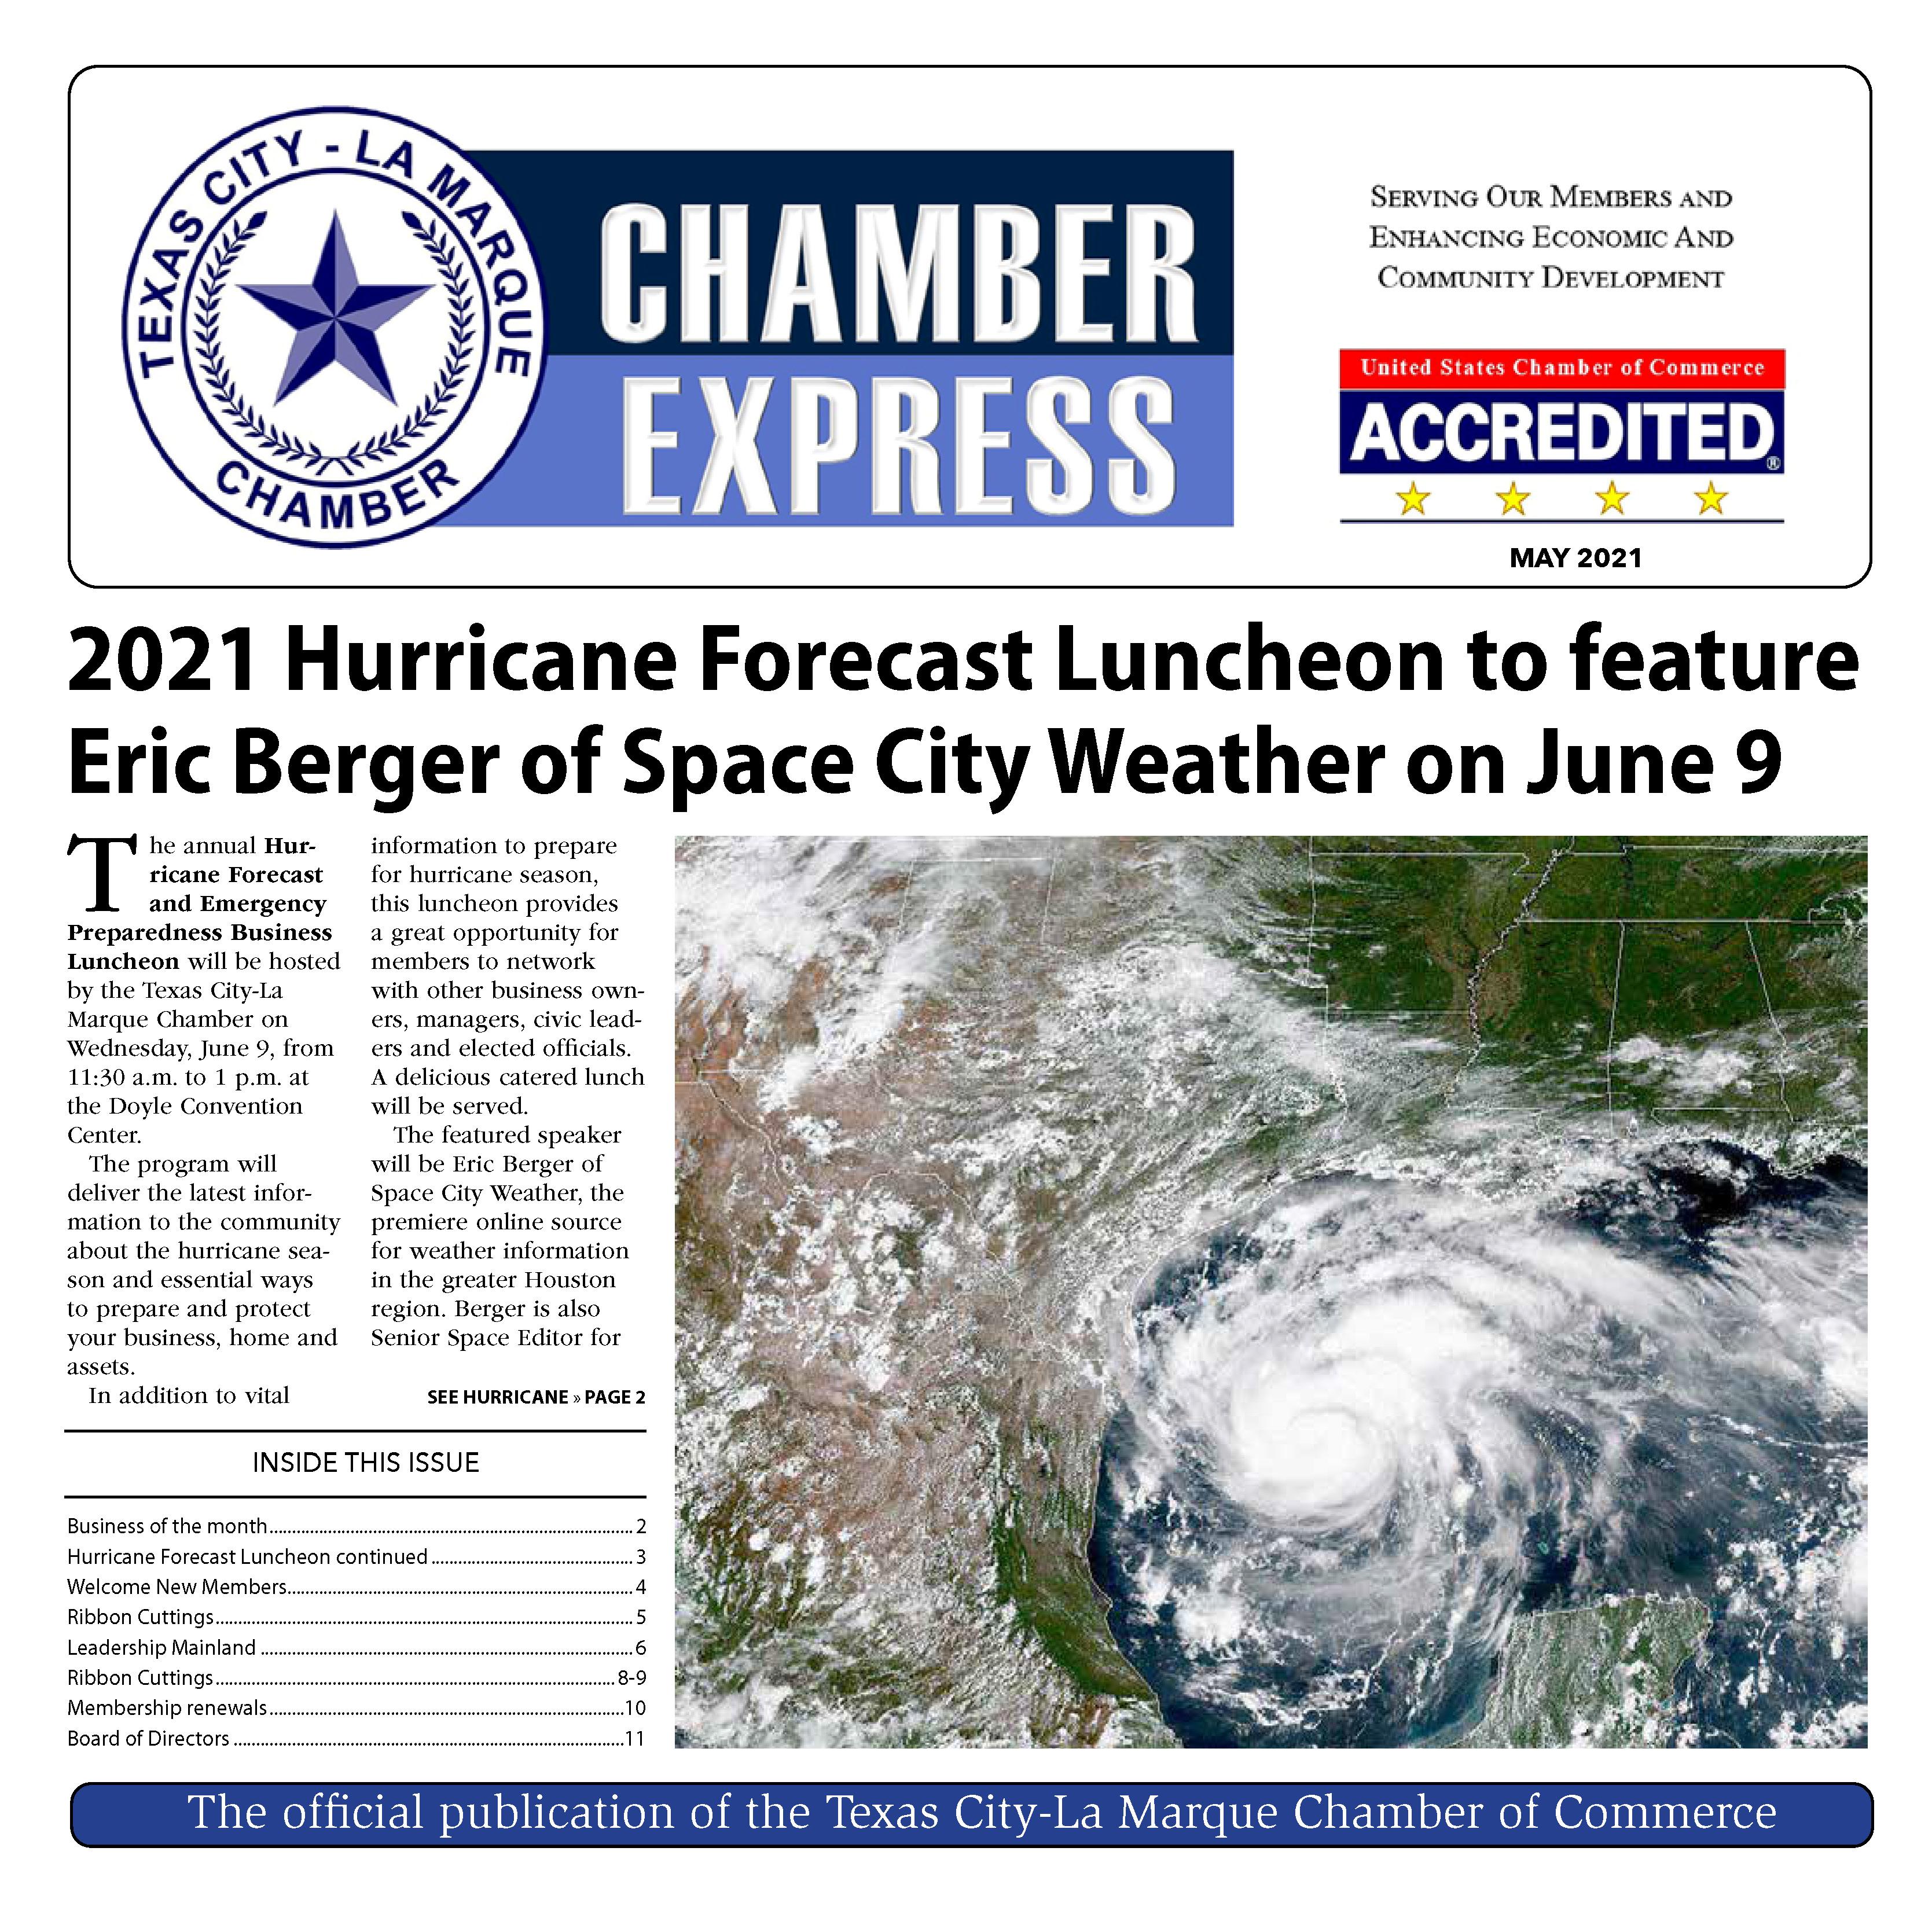 210508 TCLM Chamber Final_Page_01